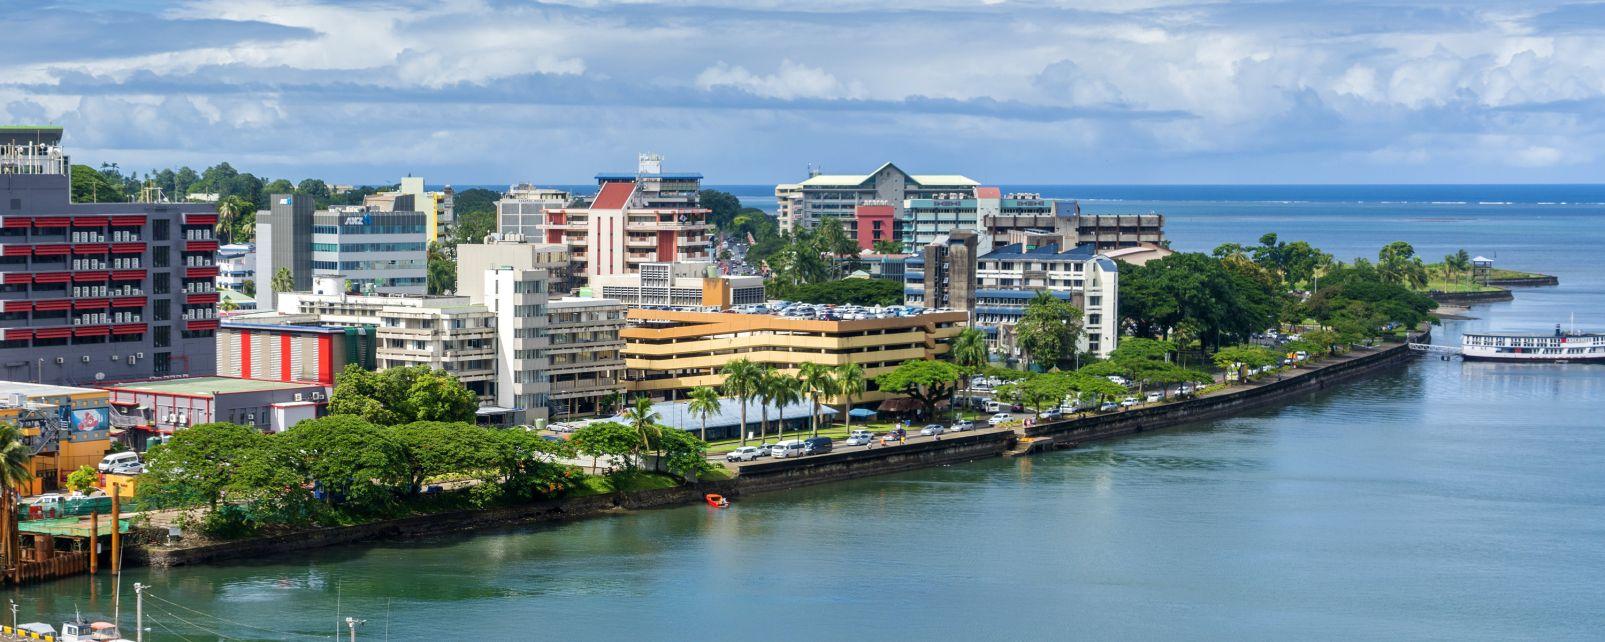 Fiji Island City